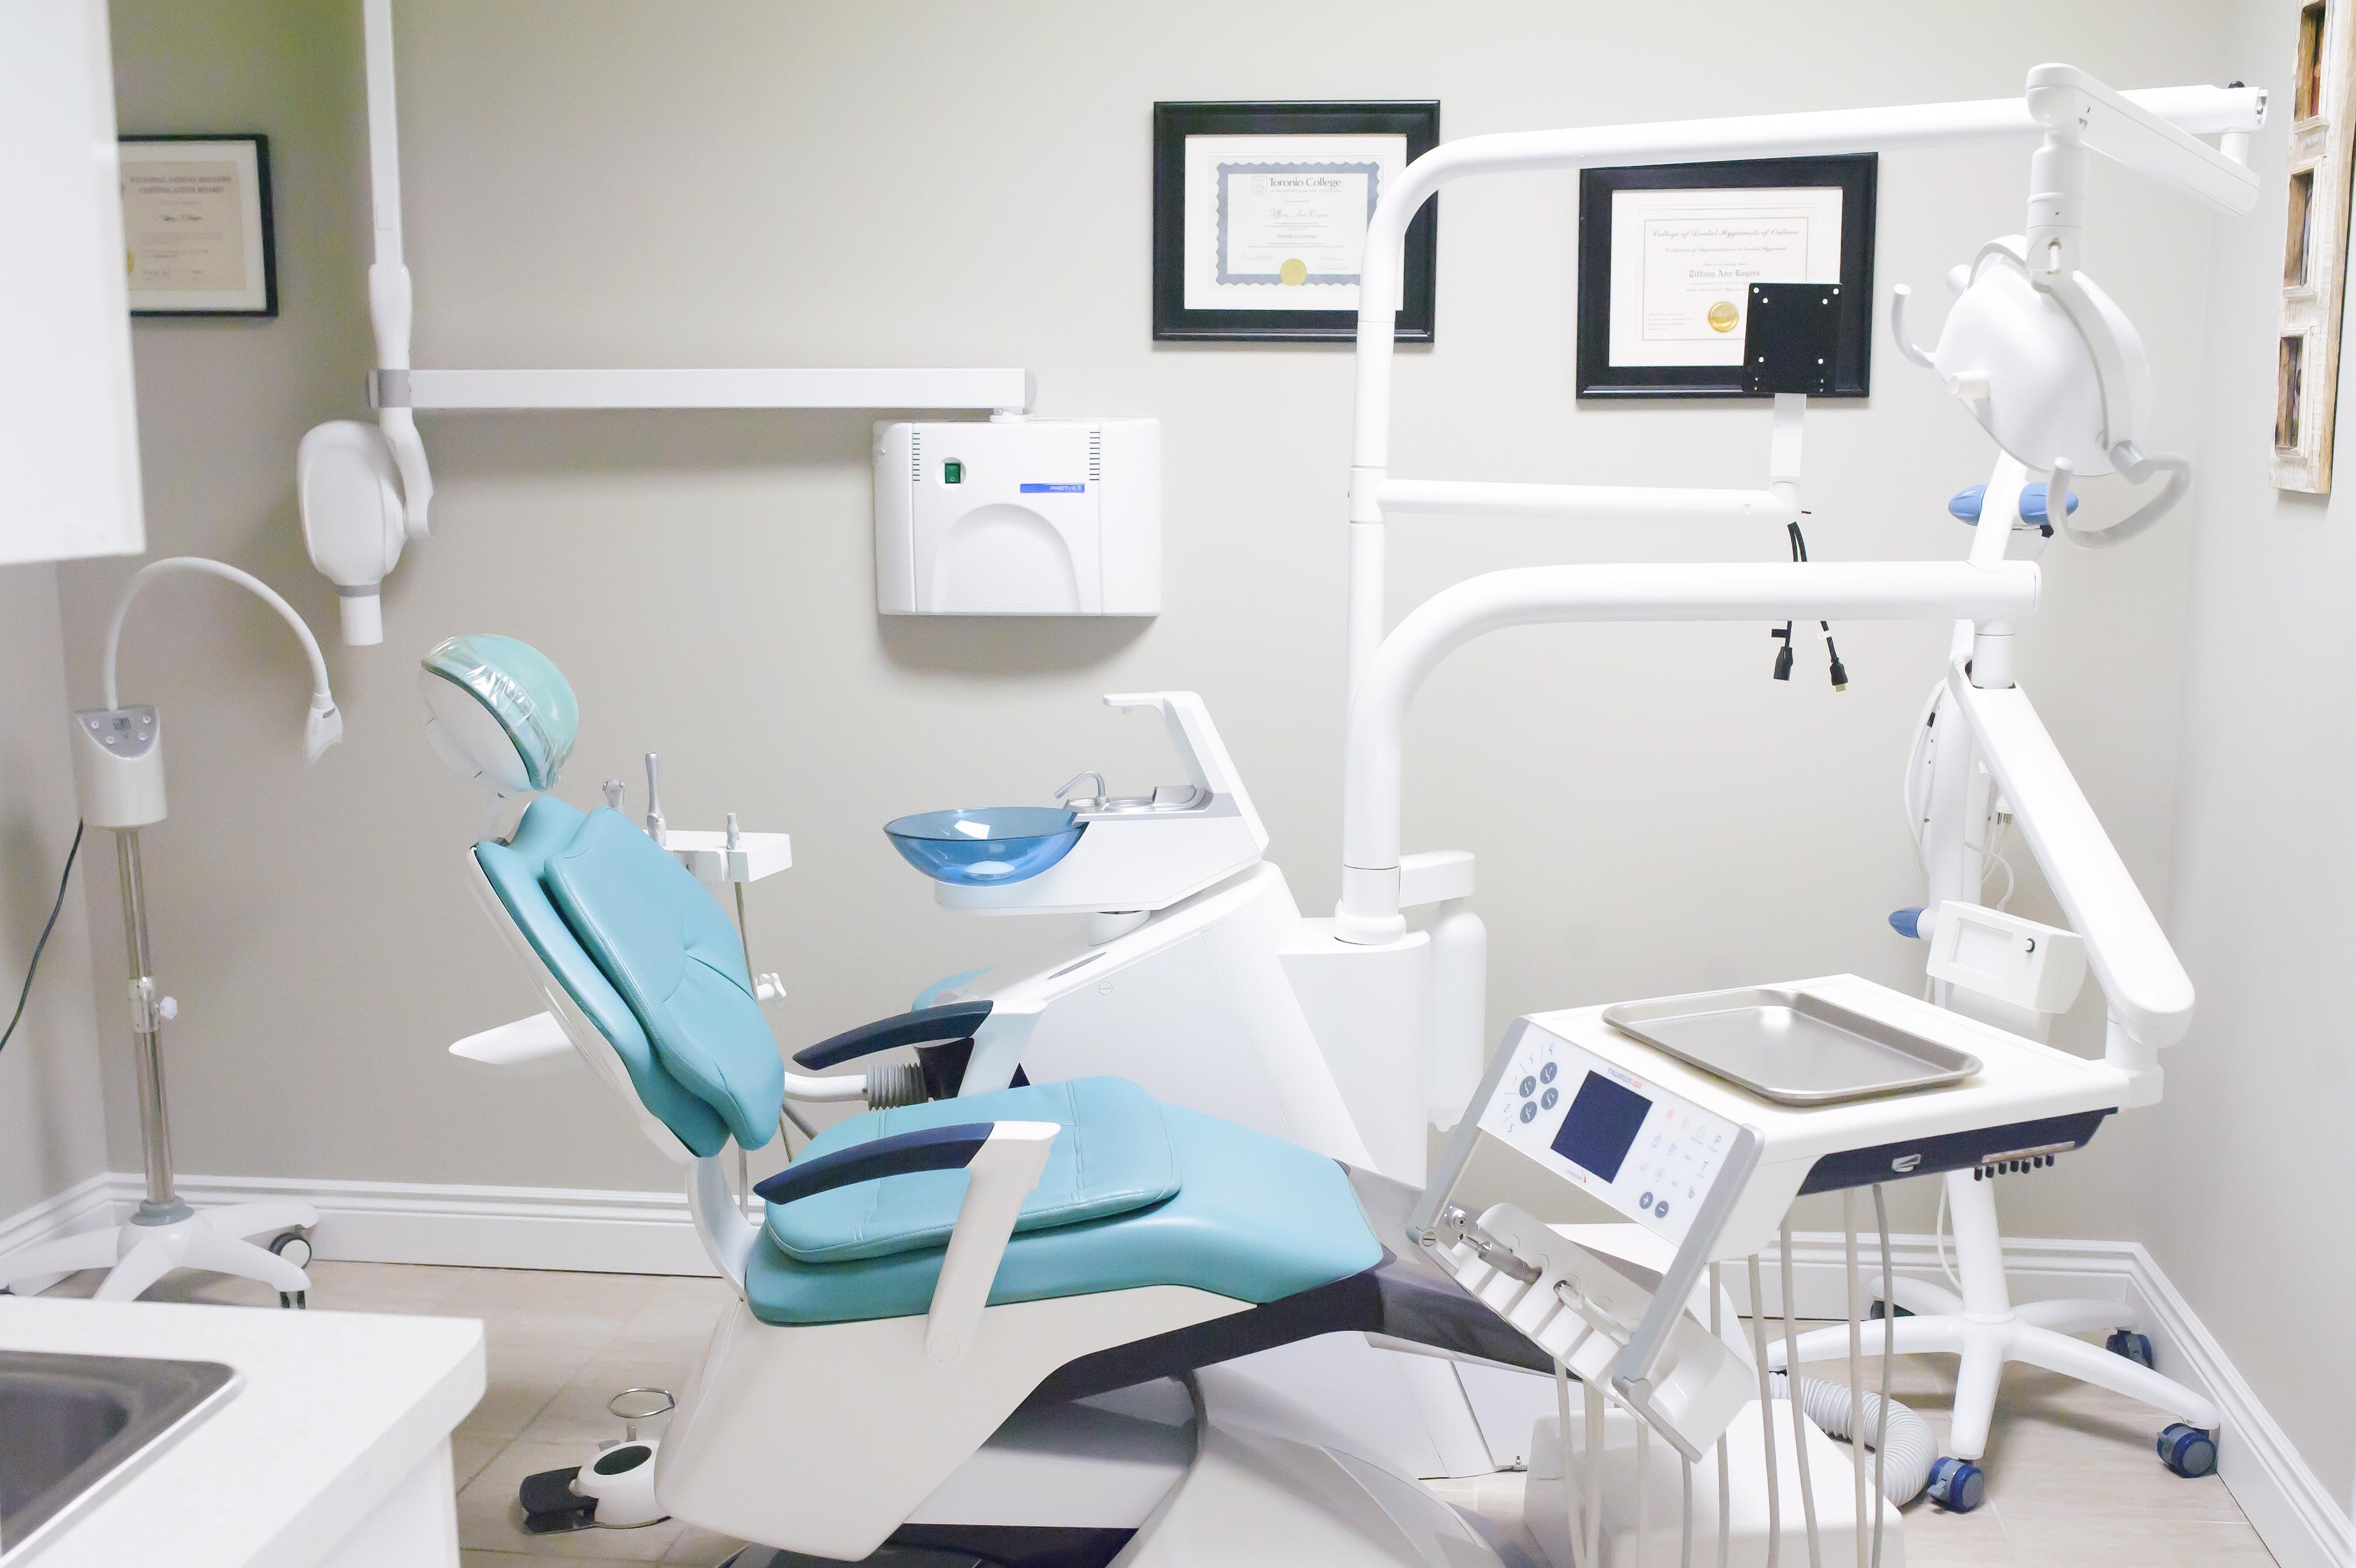 Holland River Dental